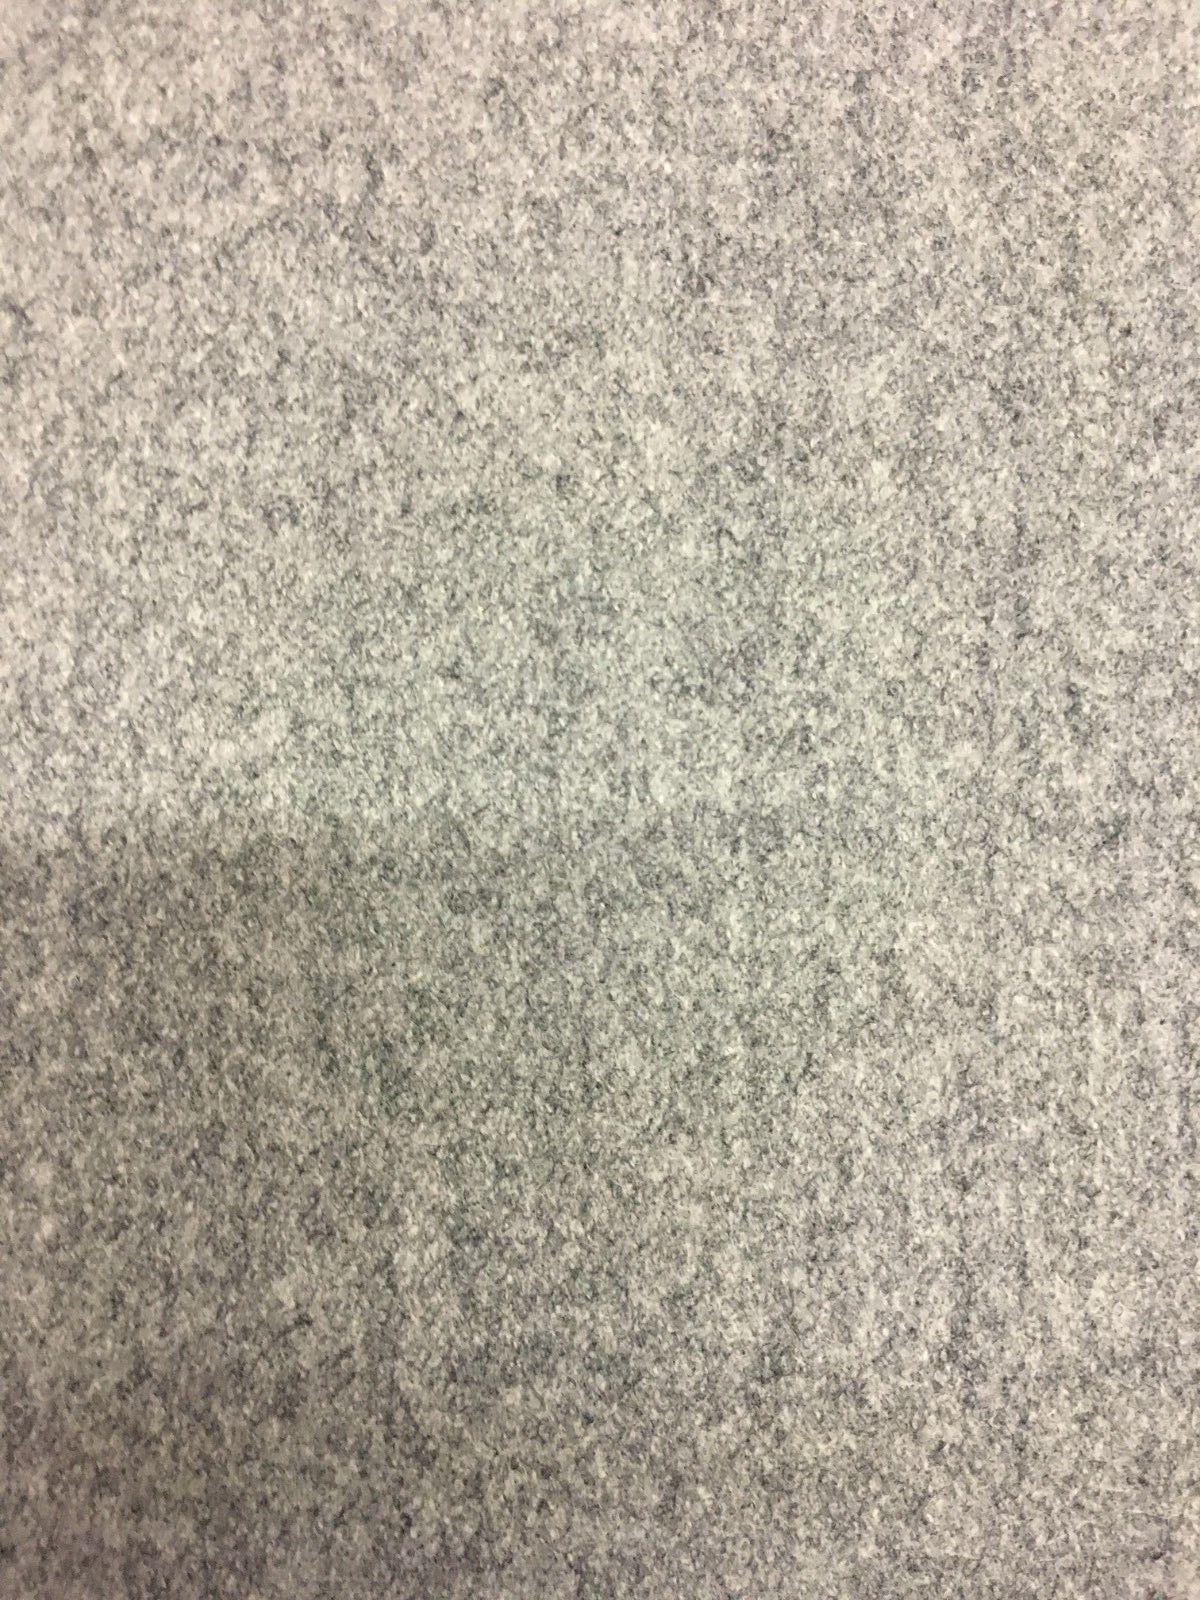 Camira Upholstery Fabric MCM Woven Gray Melange Wool 4 yds CT